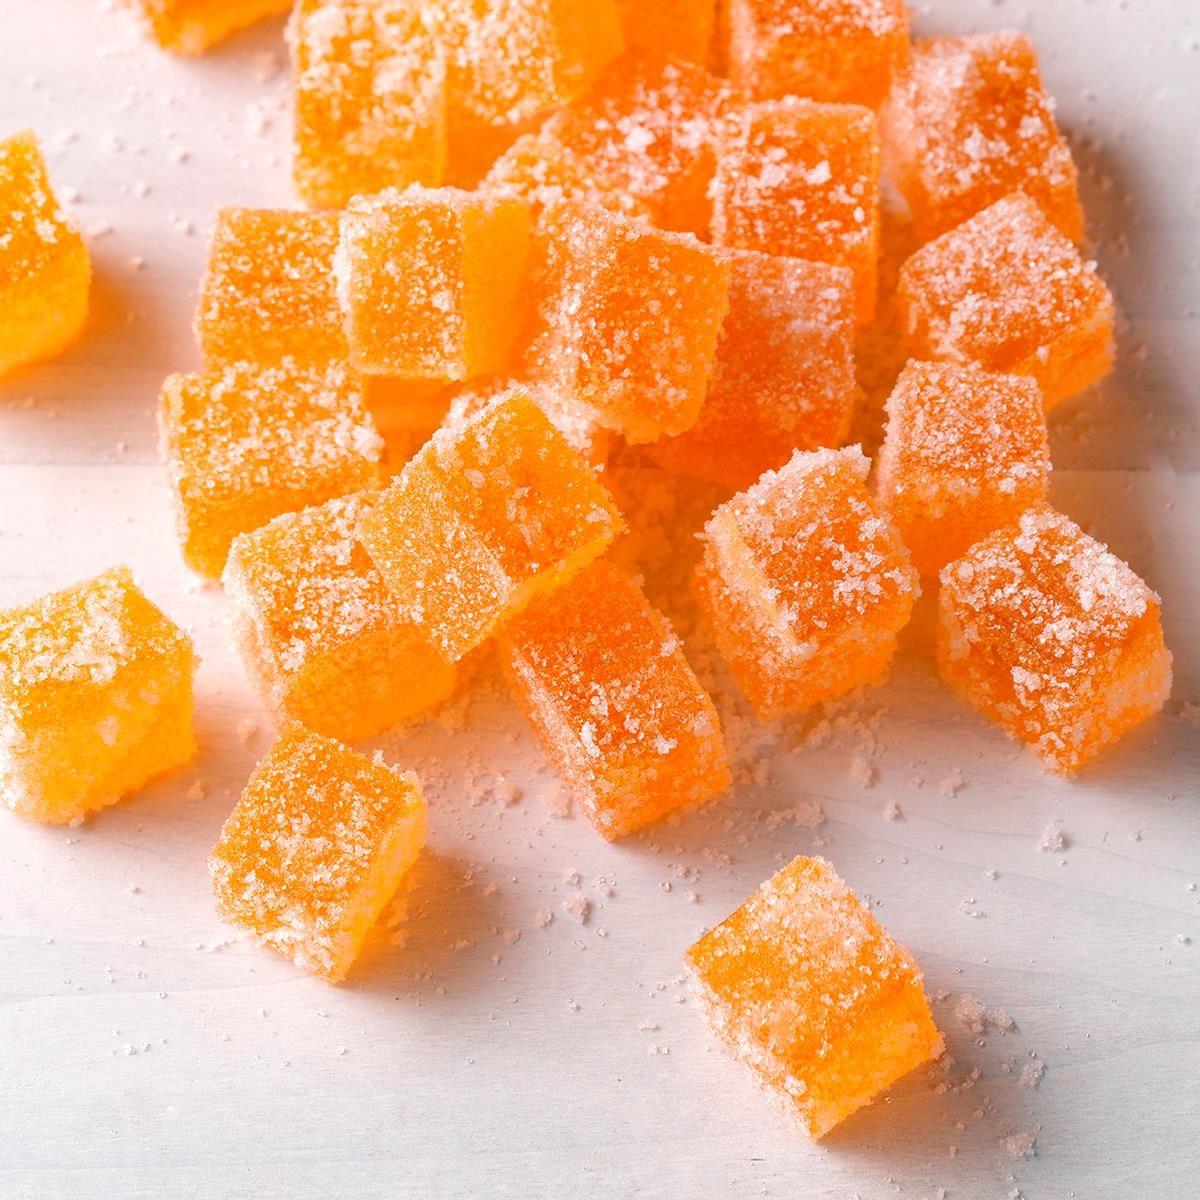 A batch of homemade orange gumdrops.